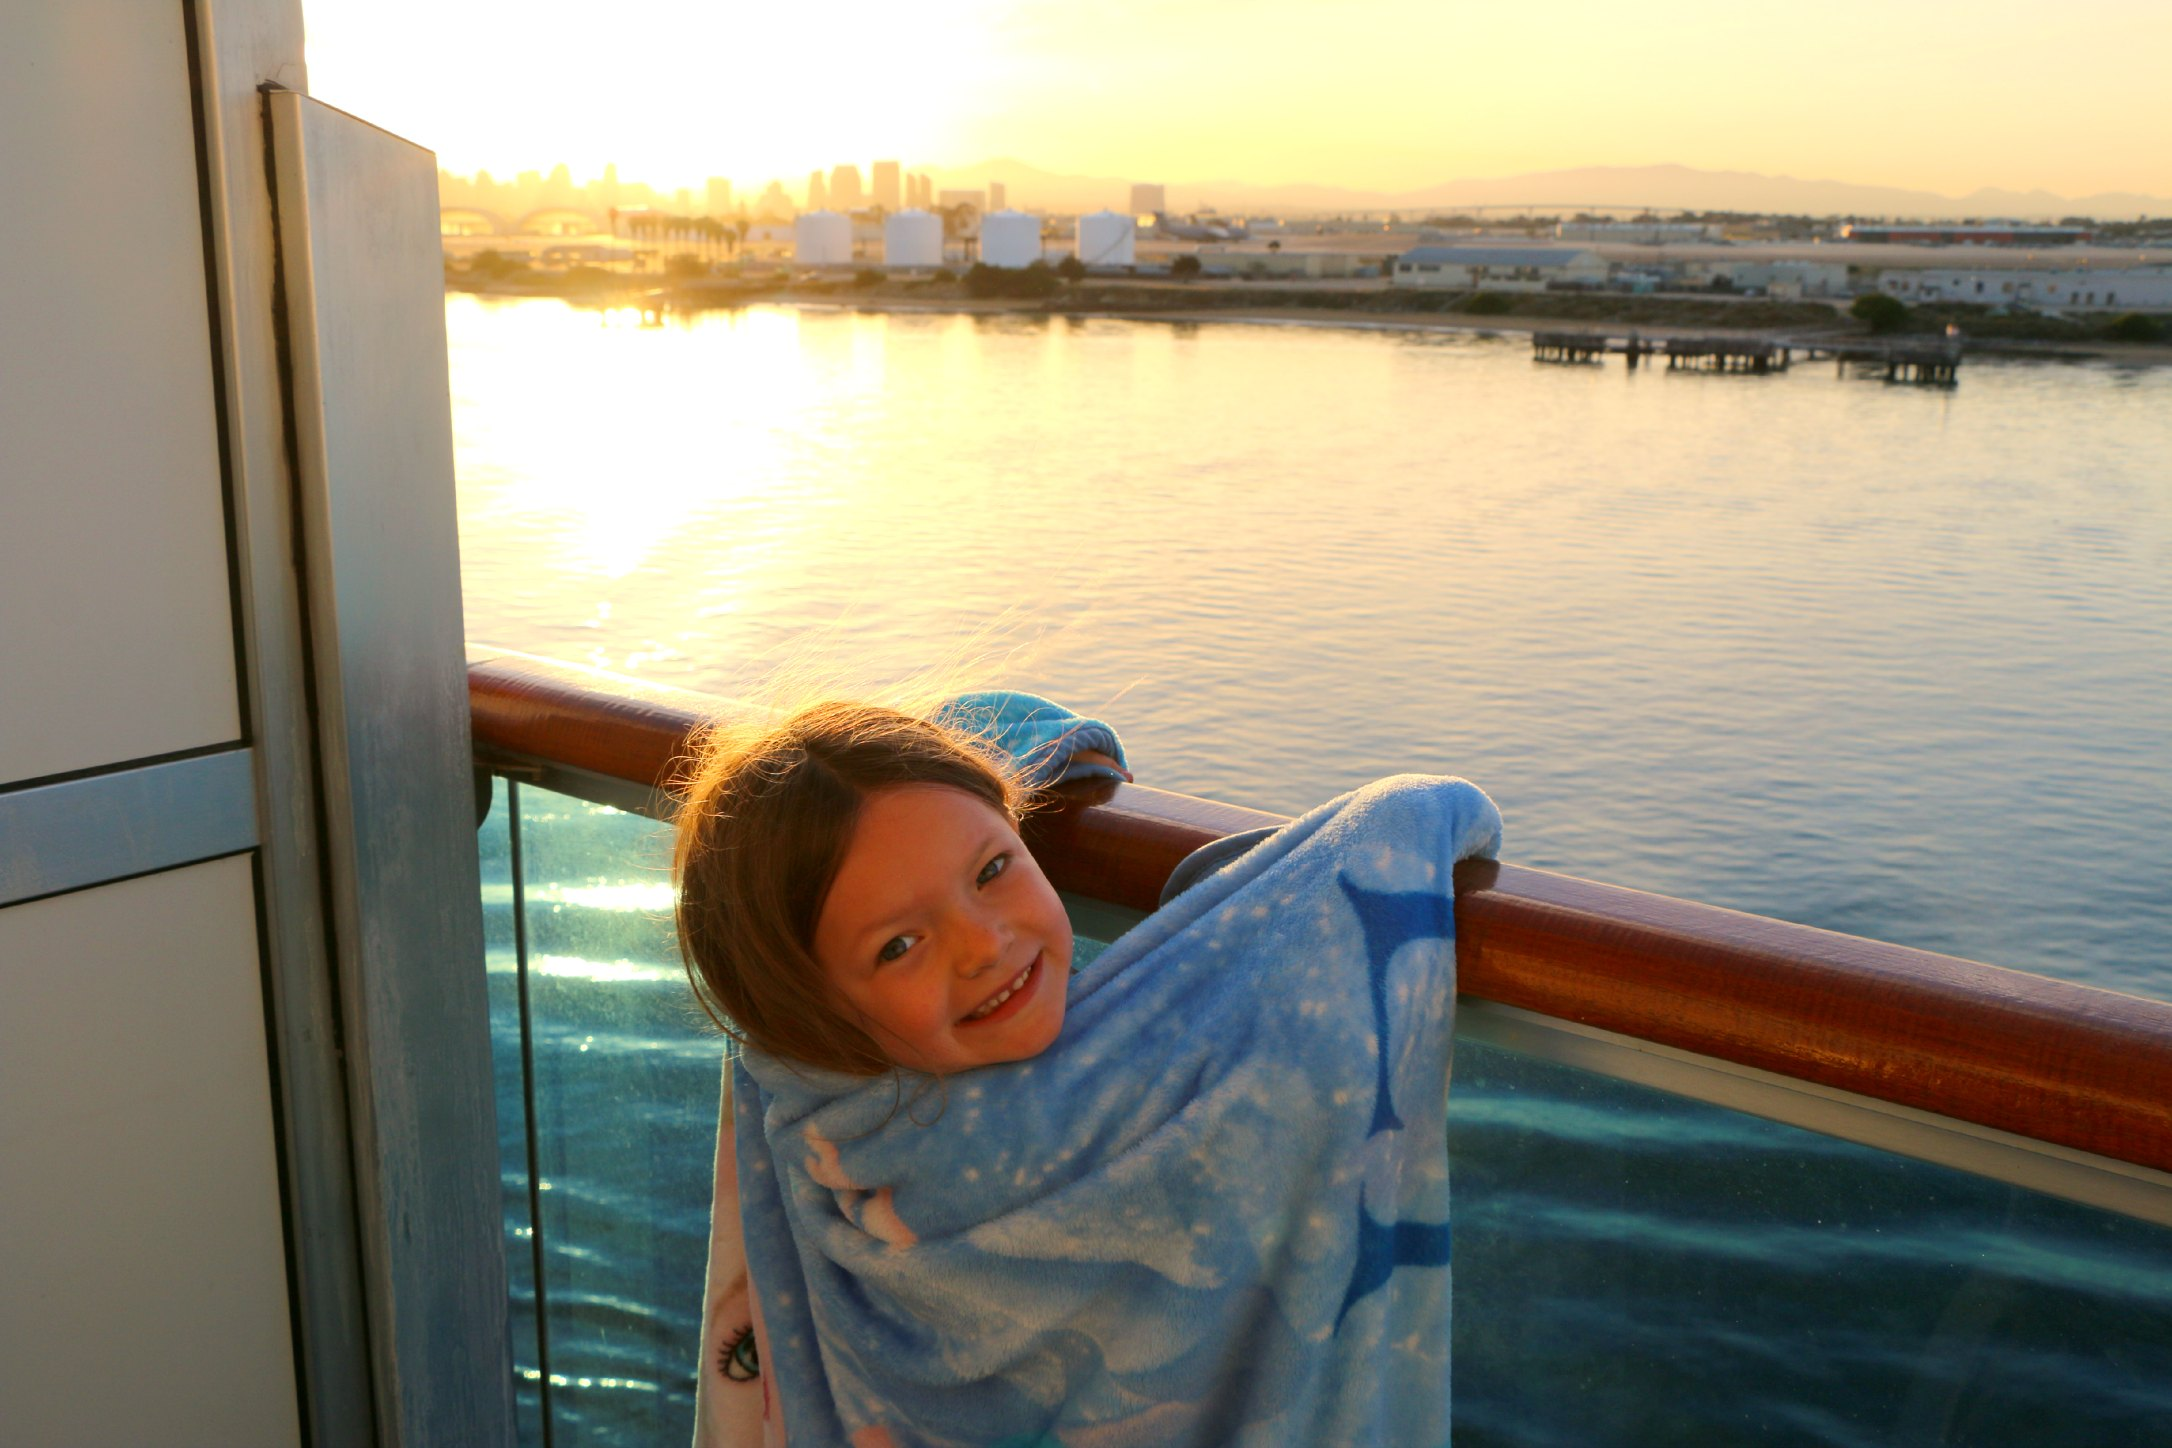 san diego cruise ship port day